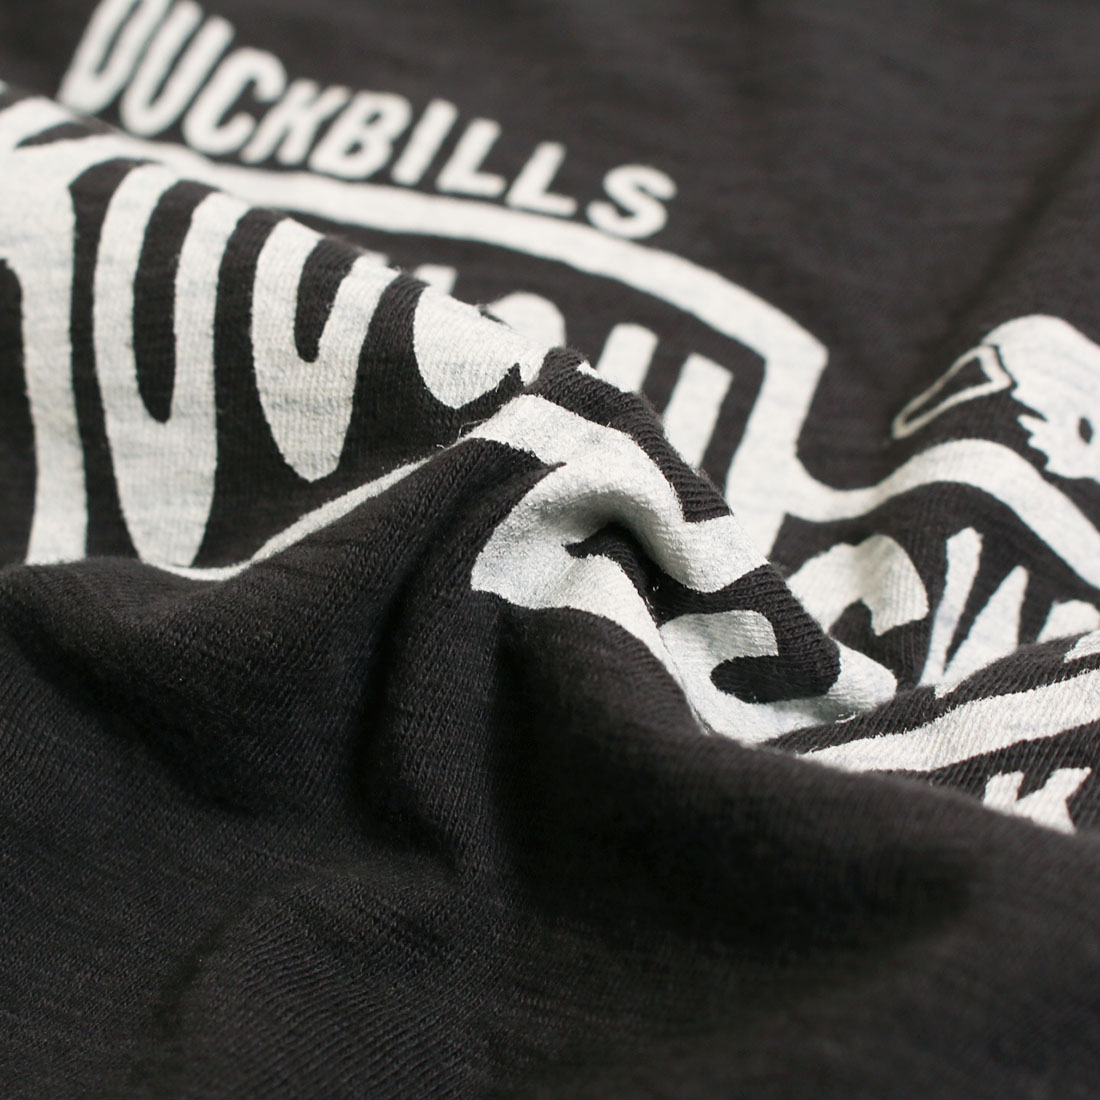 rough&swell ラフ&スウェル メンズ【送料無料】○新作○PENNANT TEE(L)半袖Tシャツ メール便不可